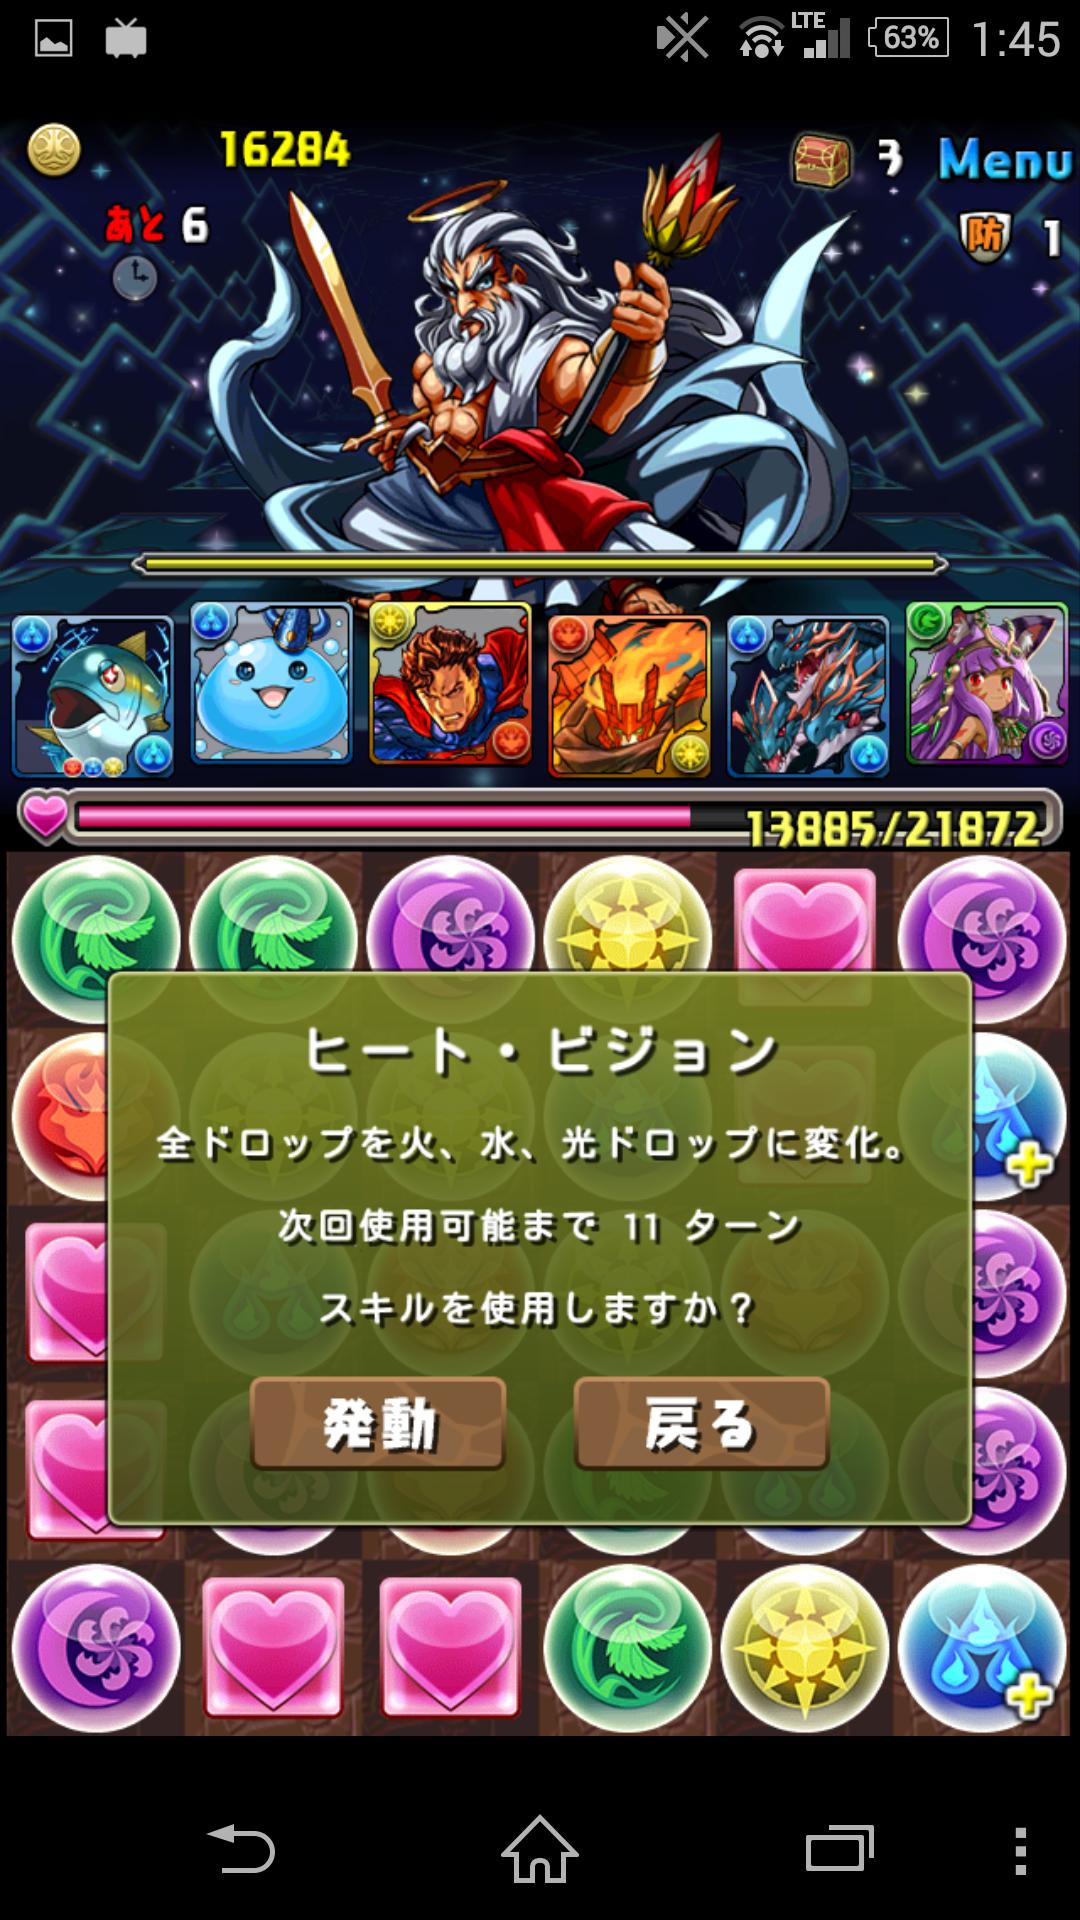 Screenshot_2014-11-13-01-45-11.png